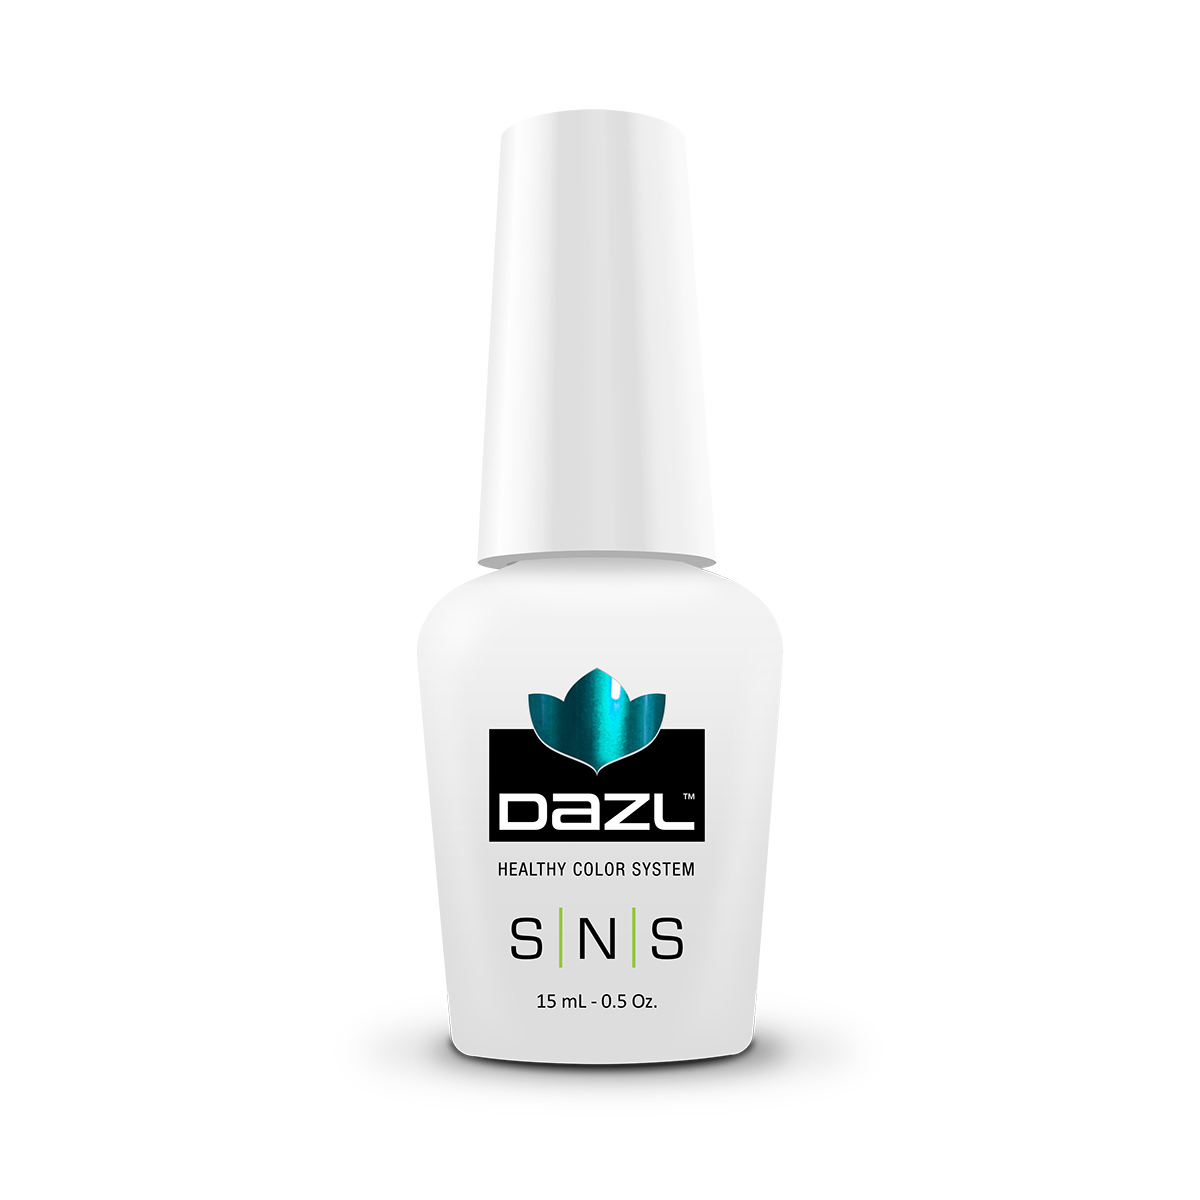 sns dazl non-uv polish dz047 jerusalem